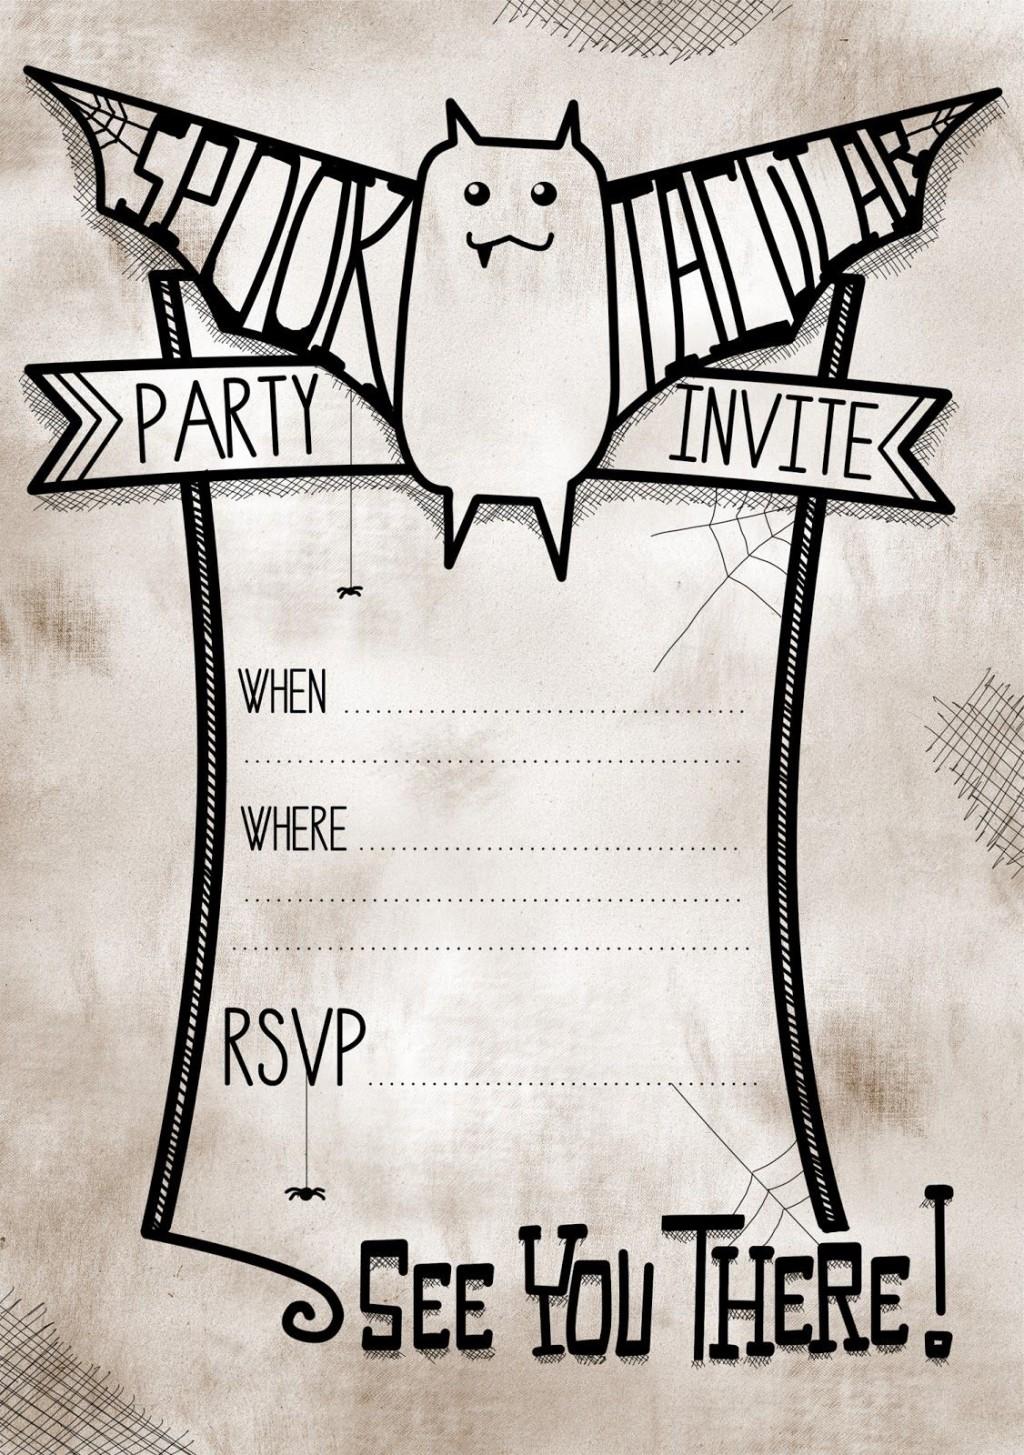 006 Impressive Free Halloween Invite Template Idea  Templates Party Invitation For WordLarge